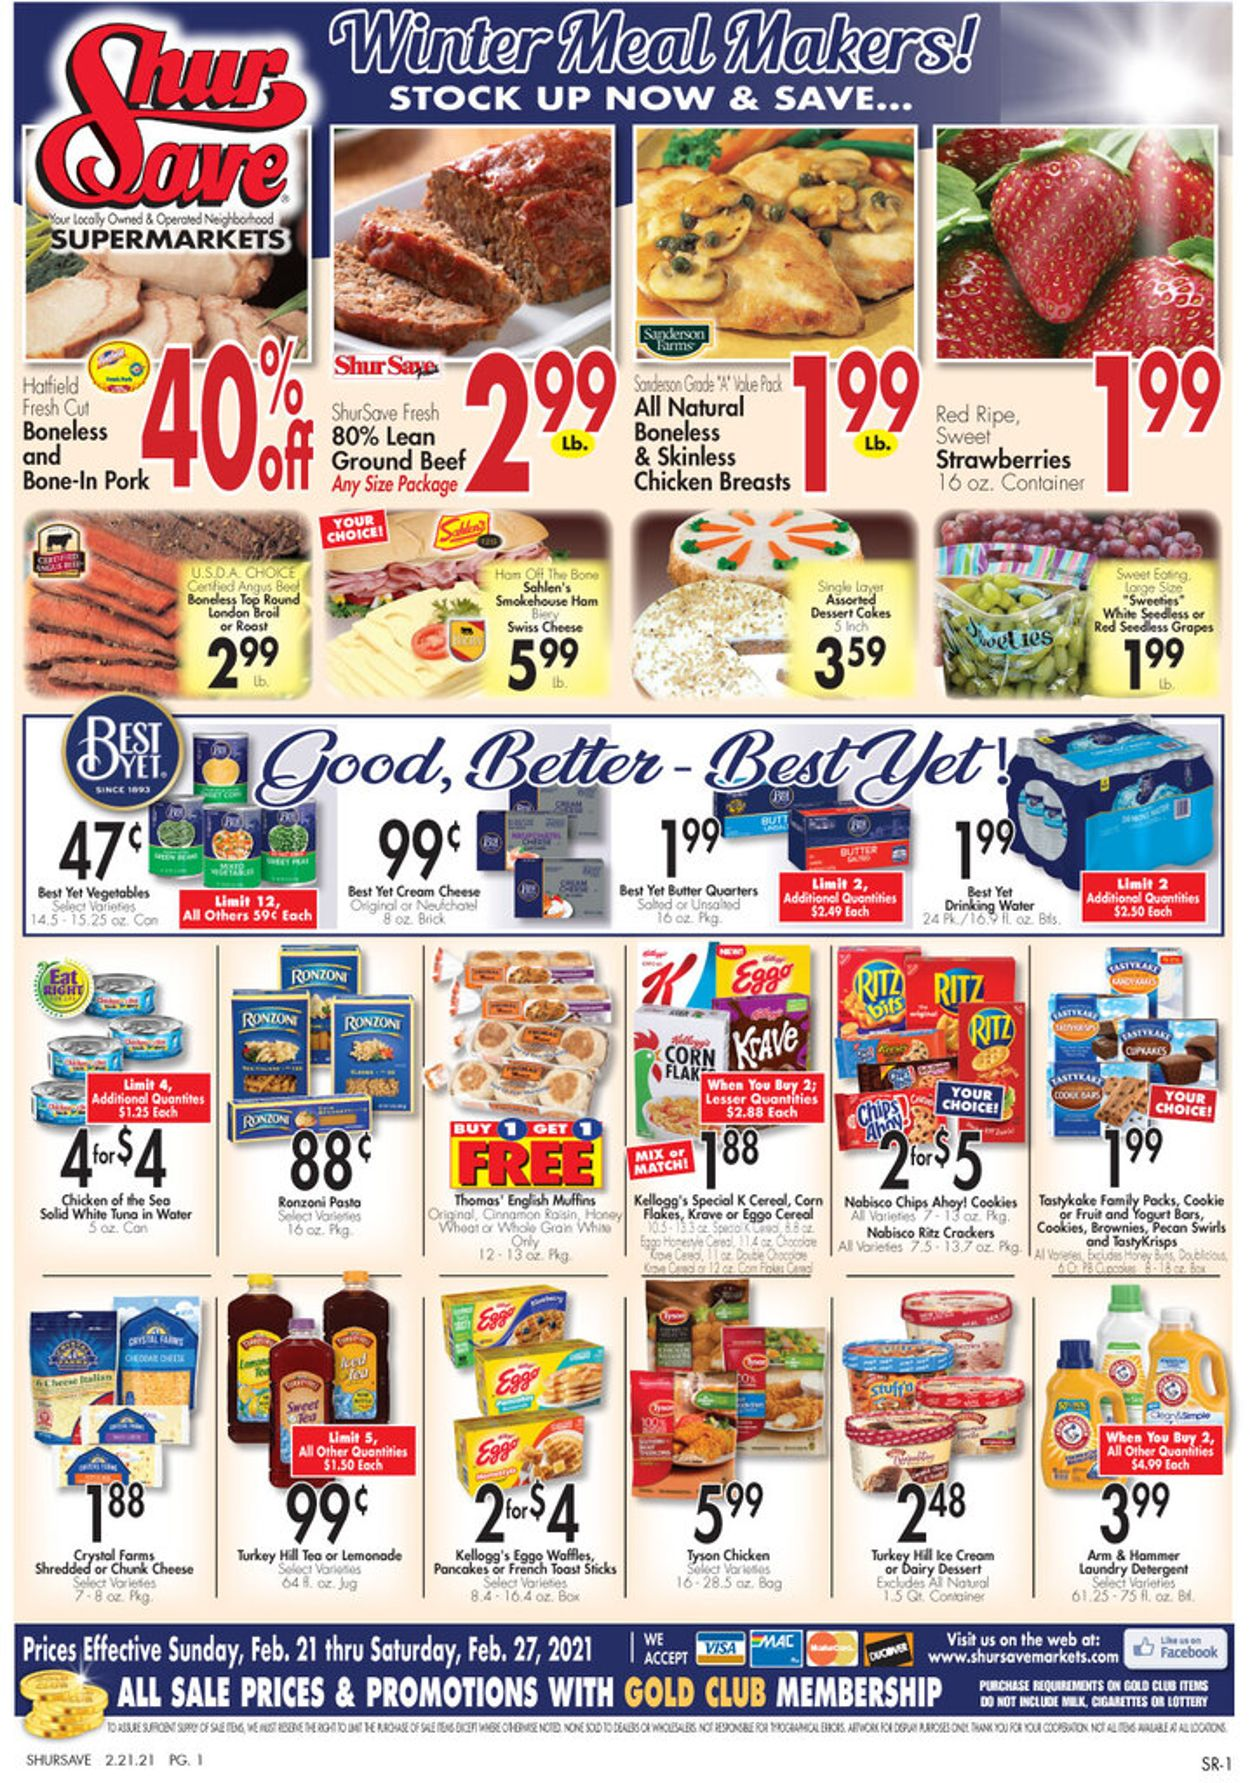 Gerrity's Supermarkets Weekly Ad Circular - valid 02/21-02/27/2021